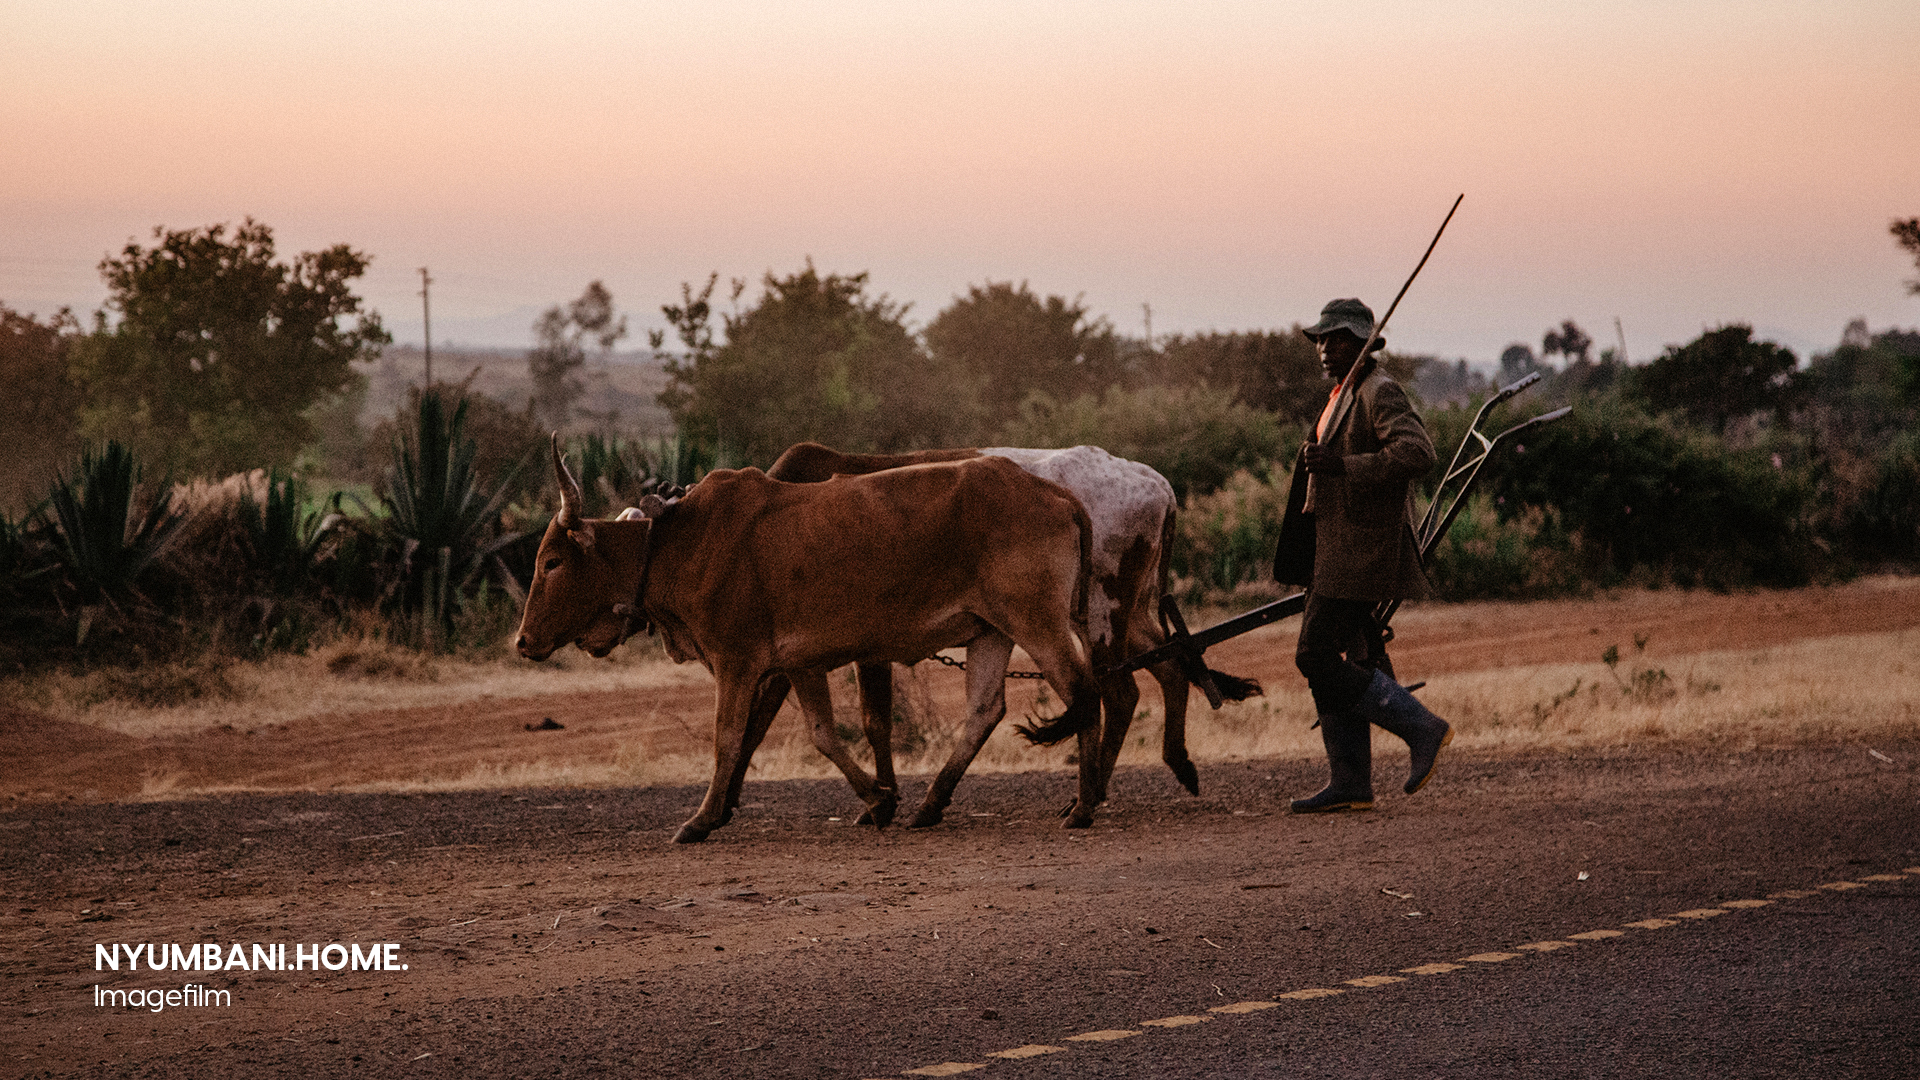 Filmproduktion Imagefilm Afrika Tansani